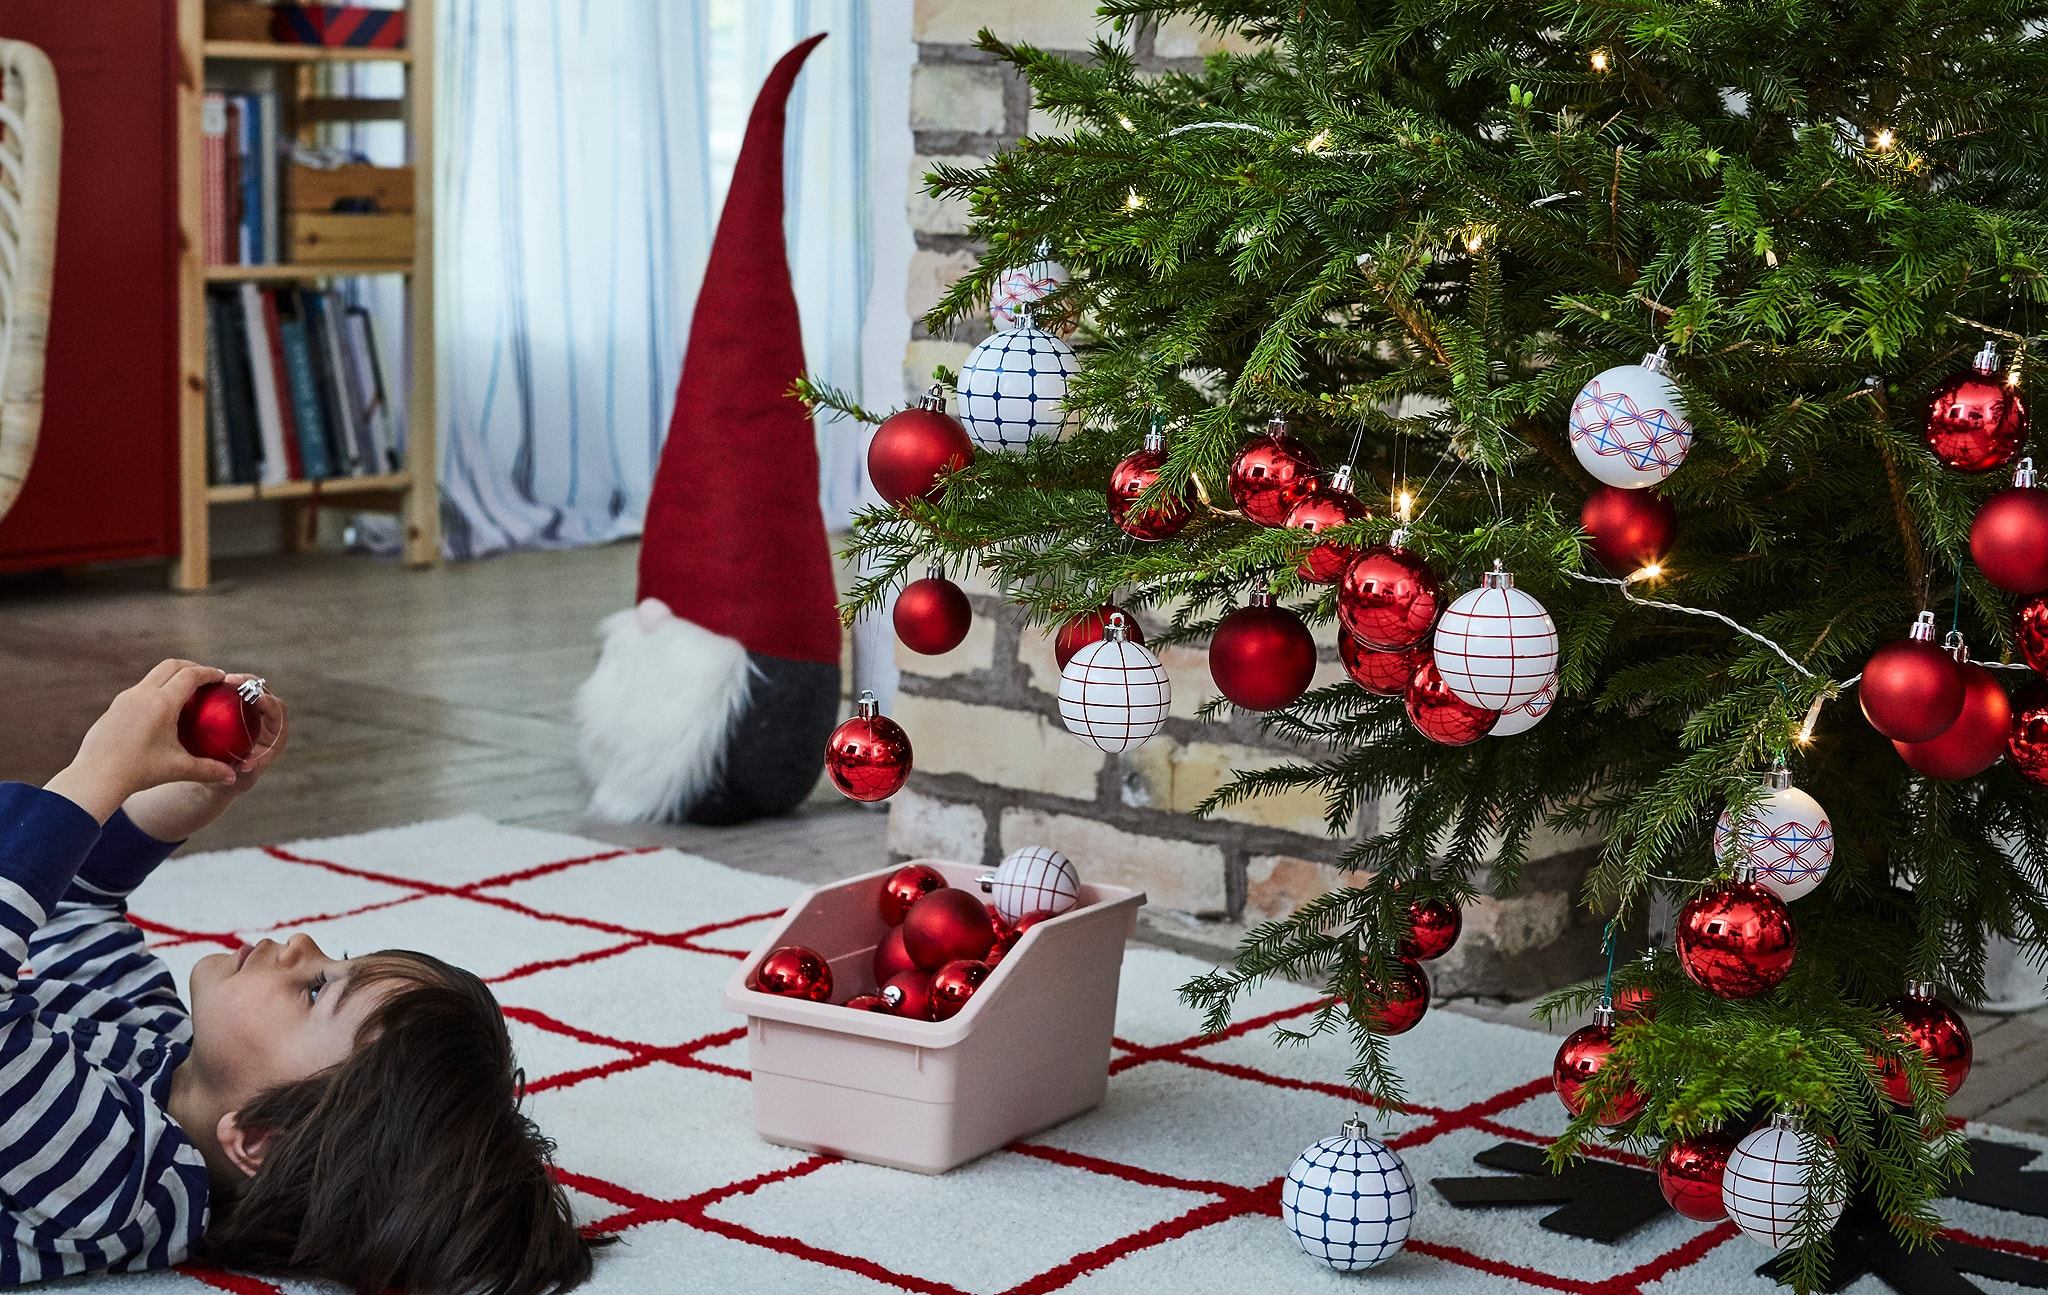 Pohon Natal penuh hiasan dengan seorang anak lelaki berbaring menghadap ke atas di atas karpet di sebelahnya, memeriksa ornamen Natal.